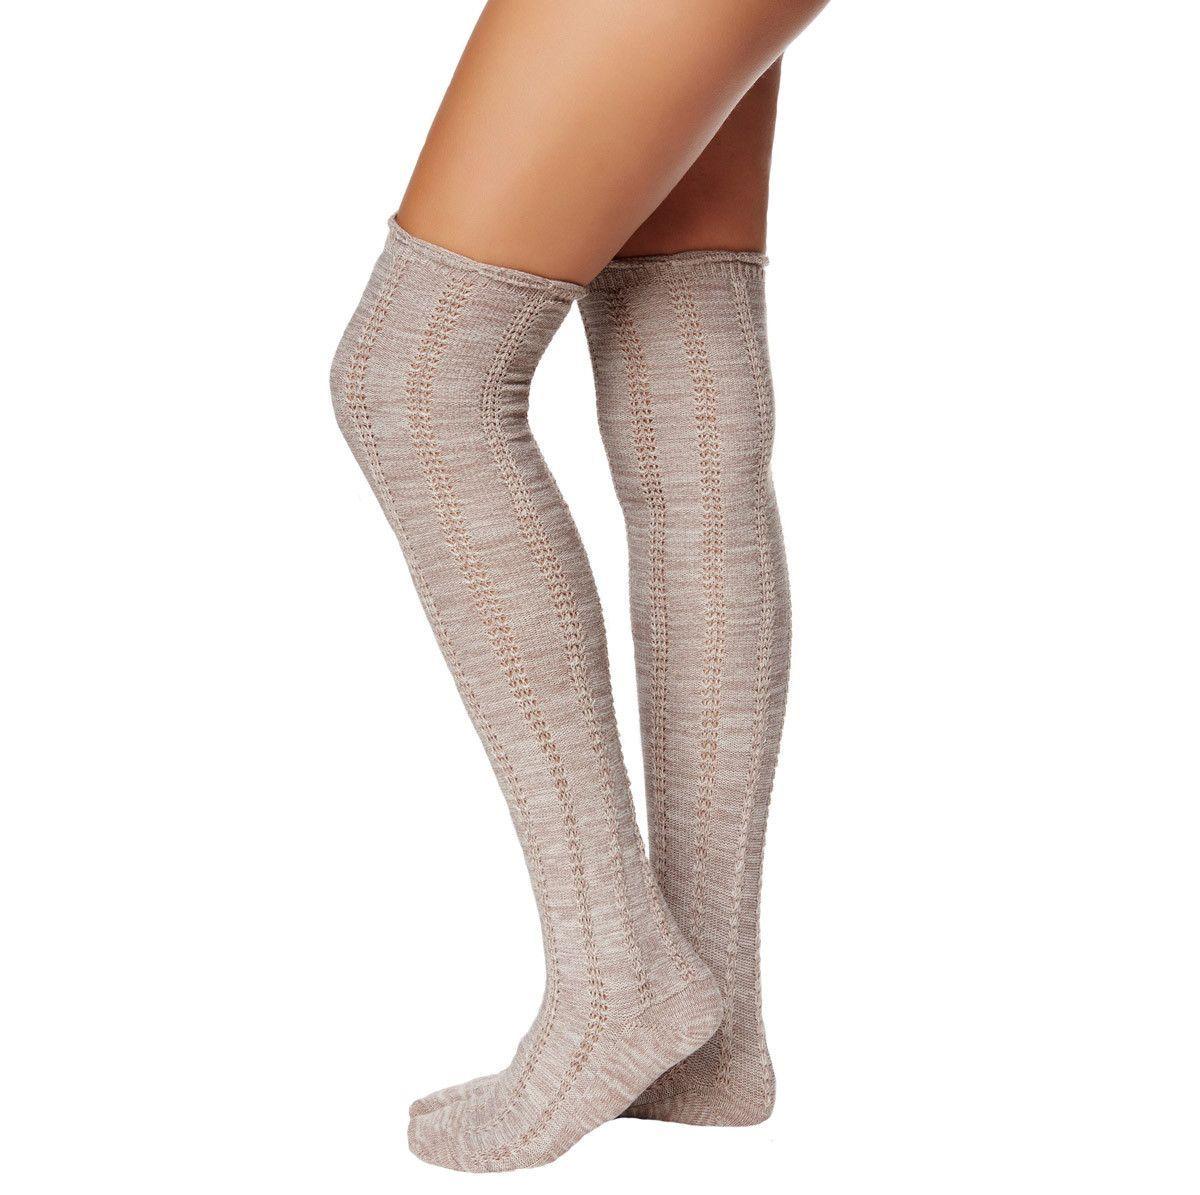 Thigh High Frayed Oatmeal Socks